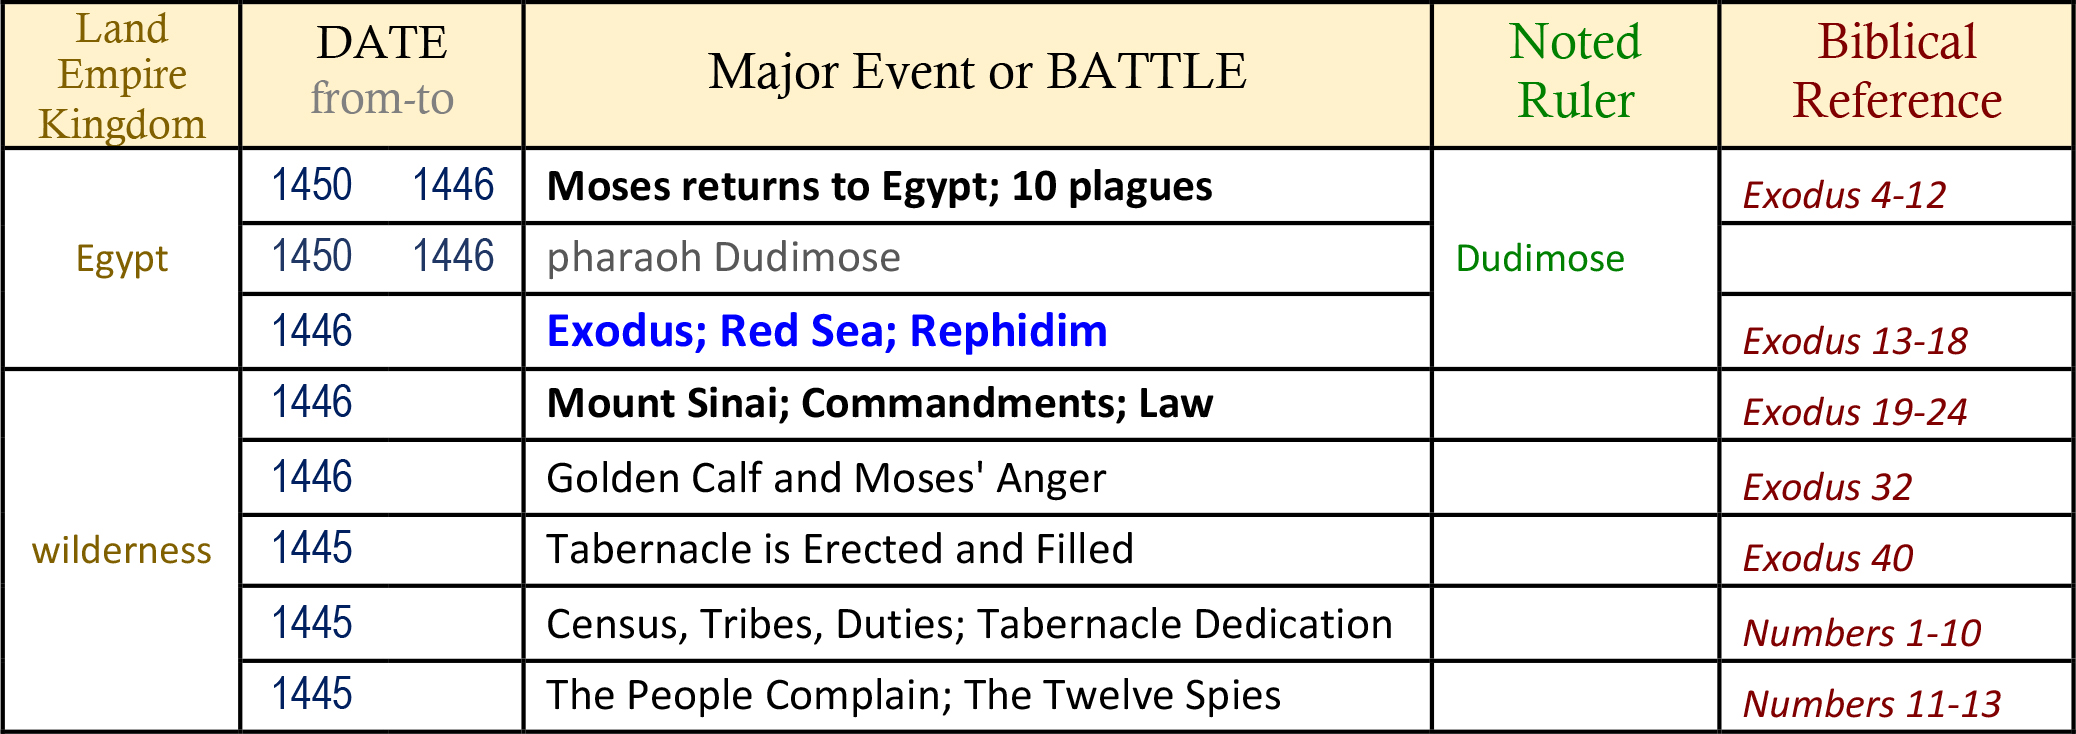 Bible Battles - Battle of REPHIDIM - Defeat of the ...